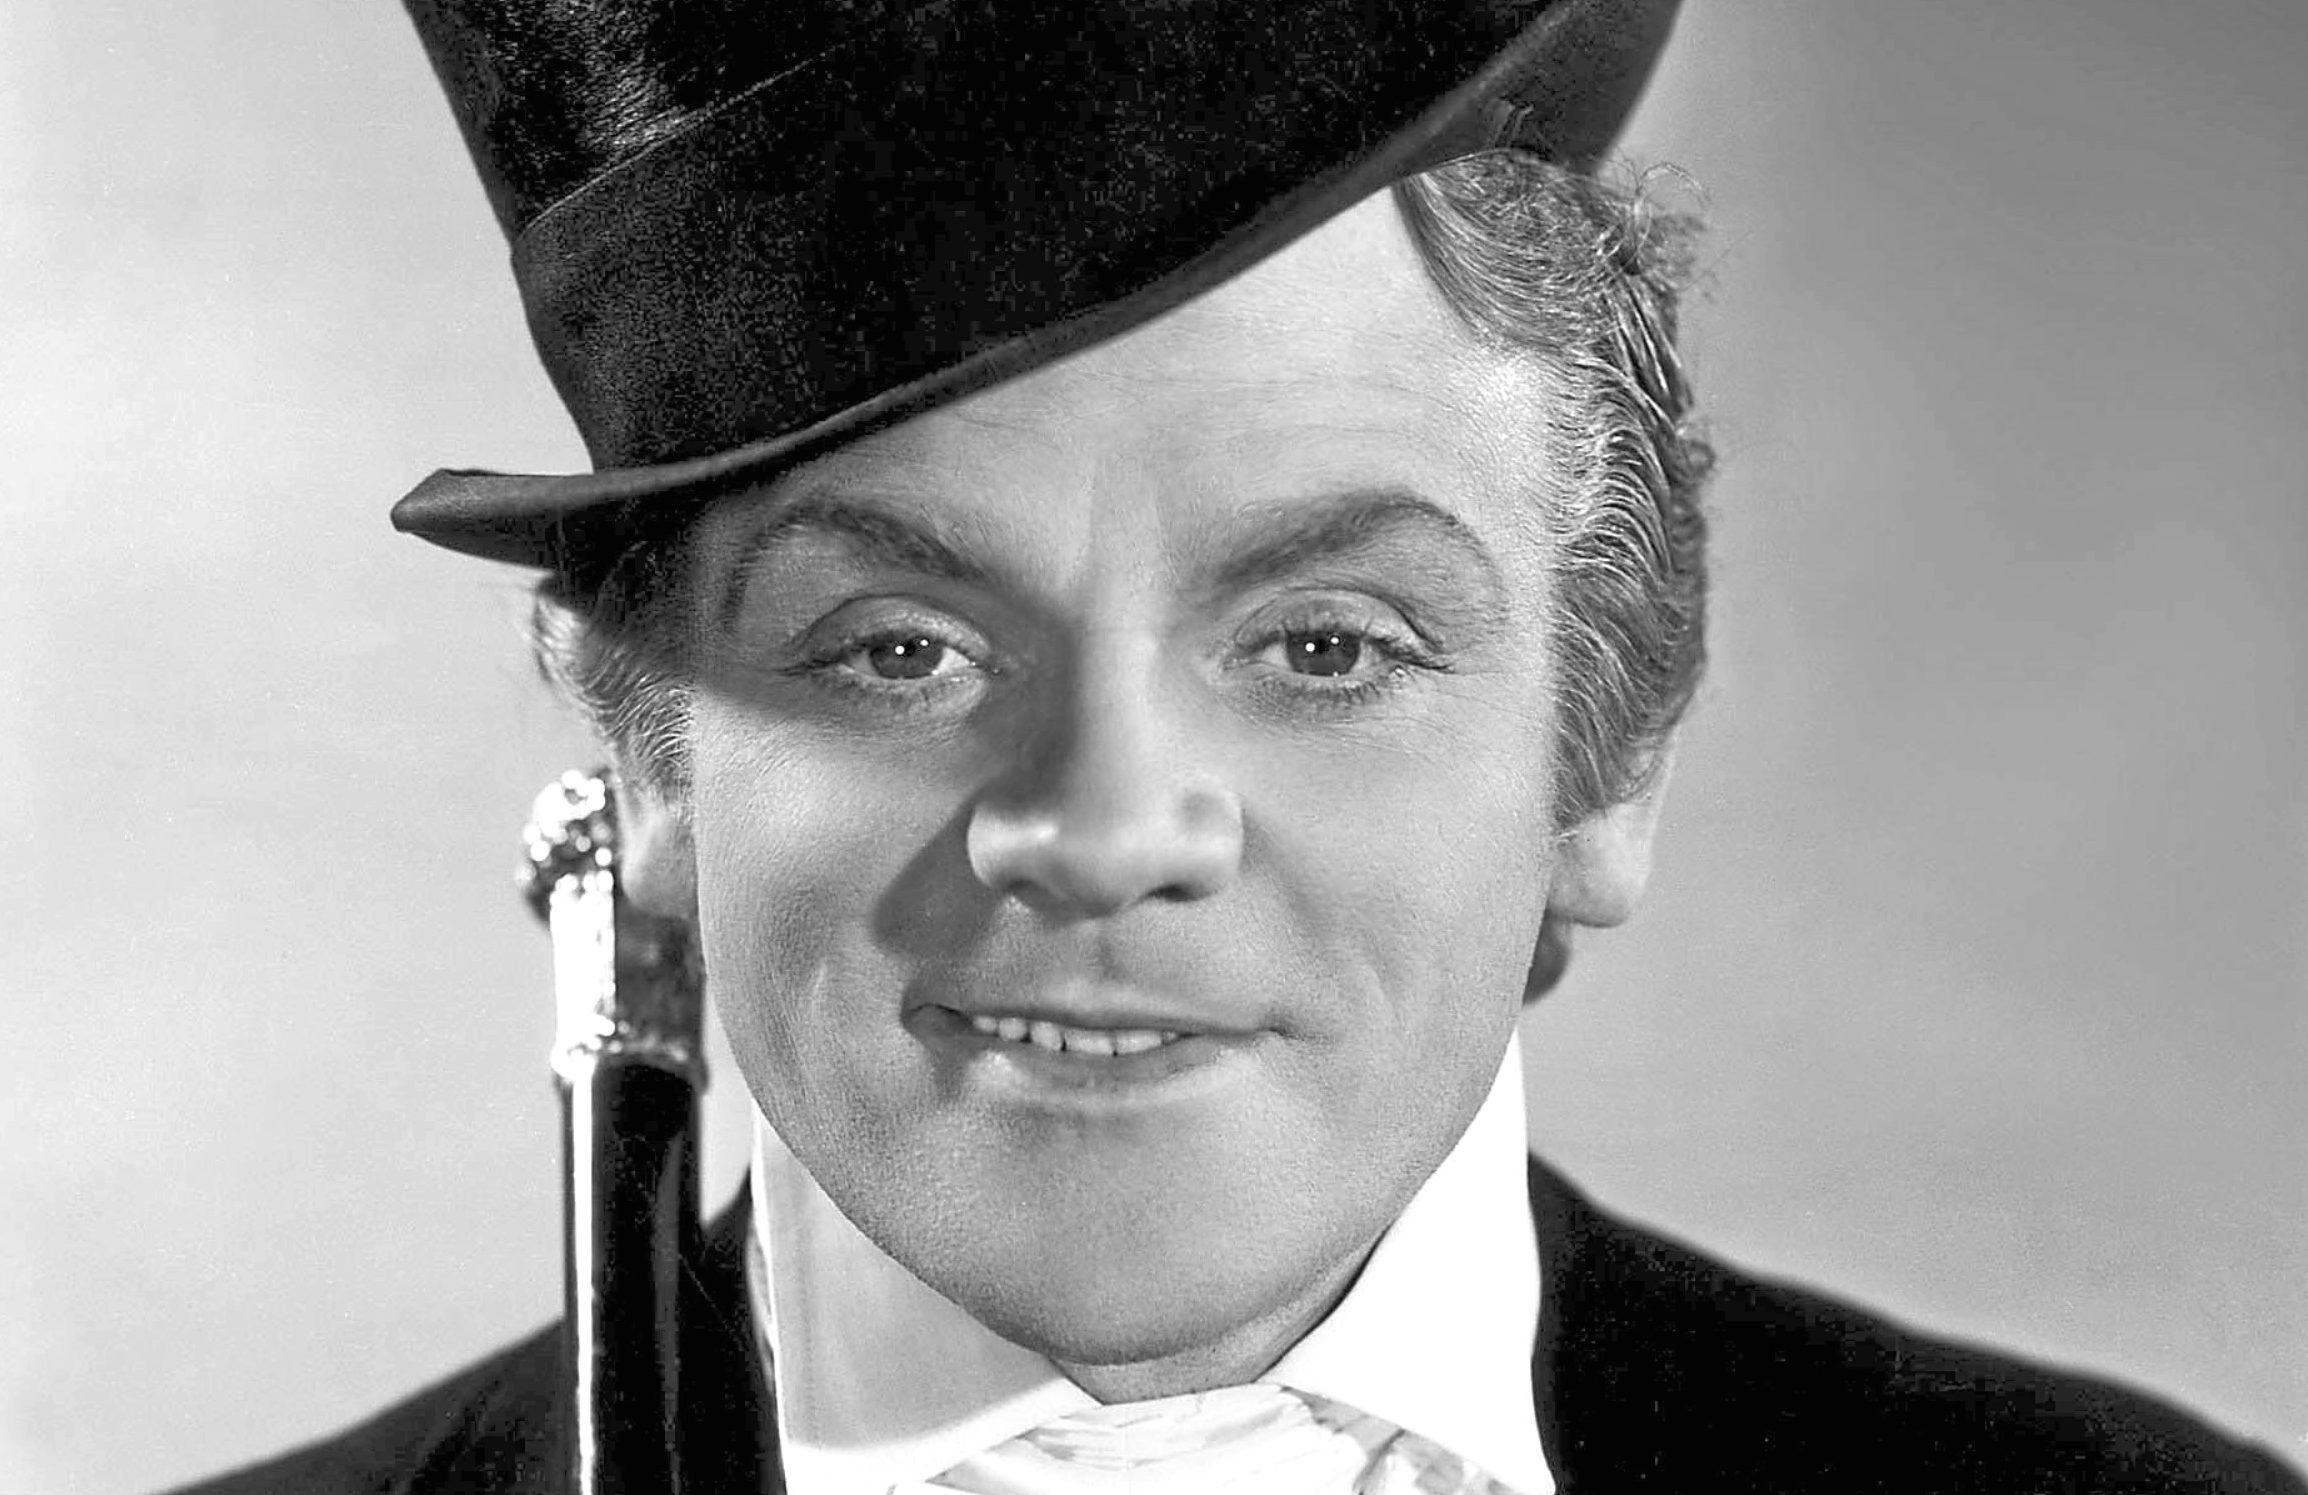 James Cagney in 1935 film Frisco Kid